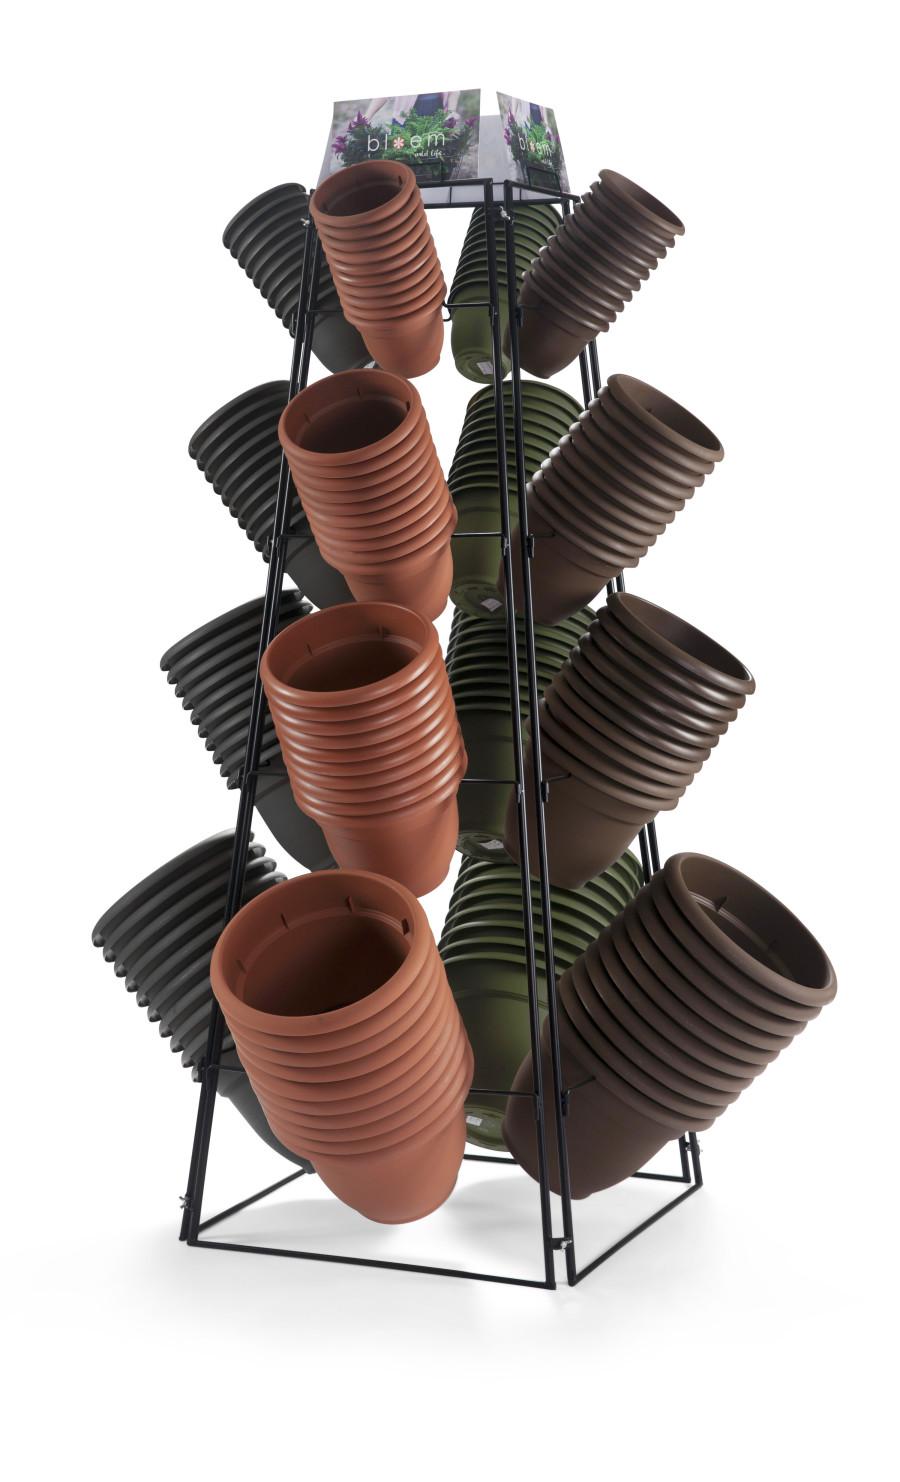 Bloem Ariana 6in & 12in Core Display Charcoal, Chocolate, Terra Cotta, Living Green 1ea/160Pc